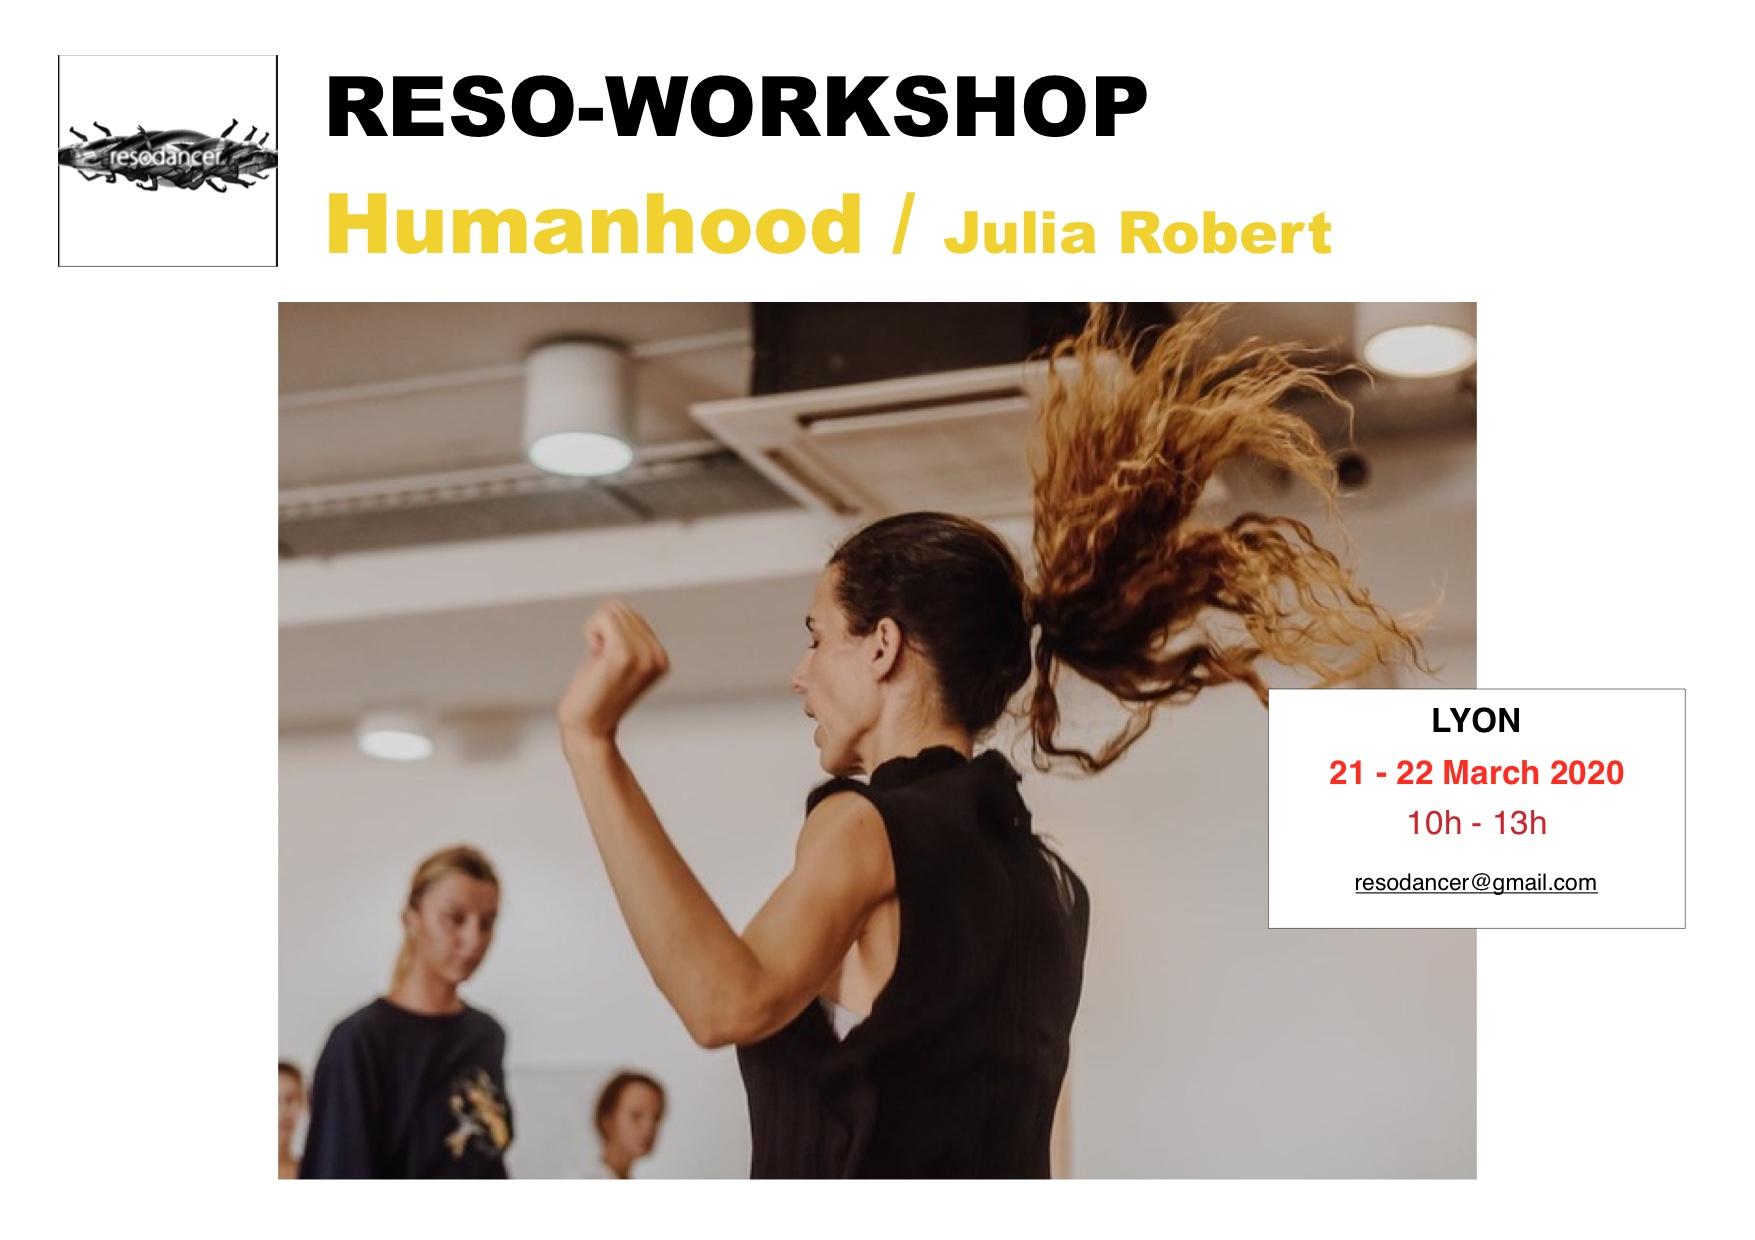 reso-workshop humanhood